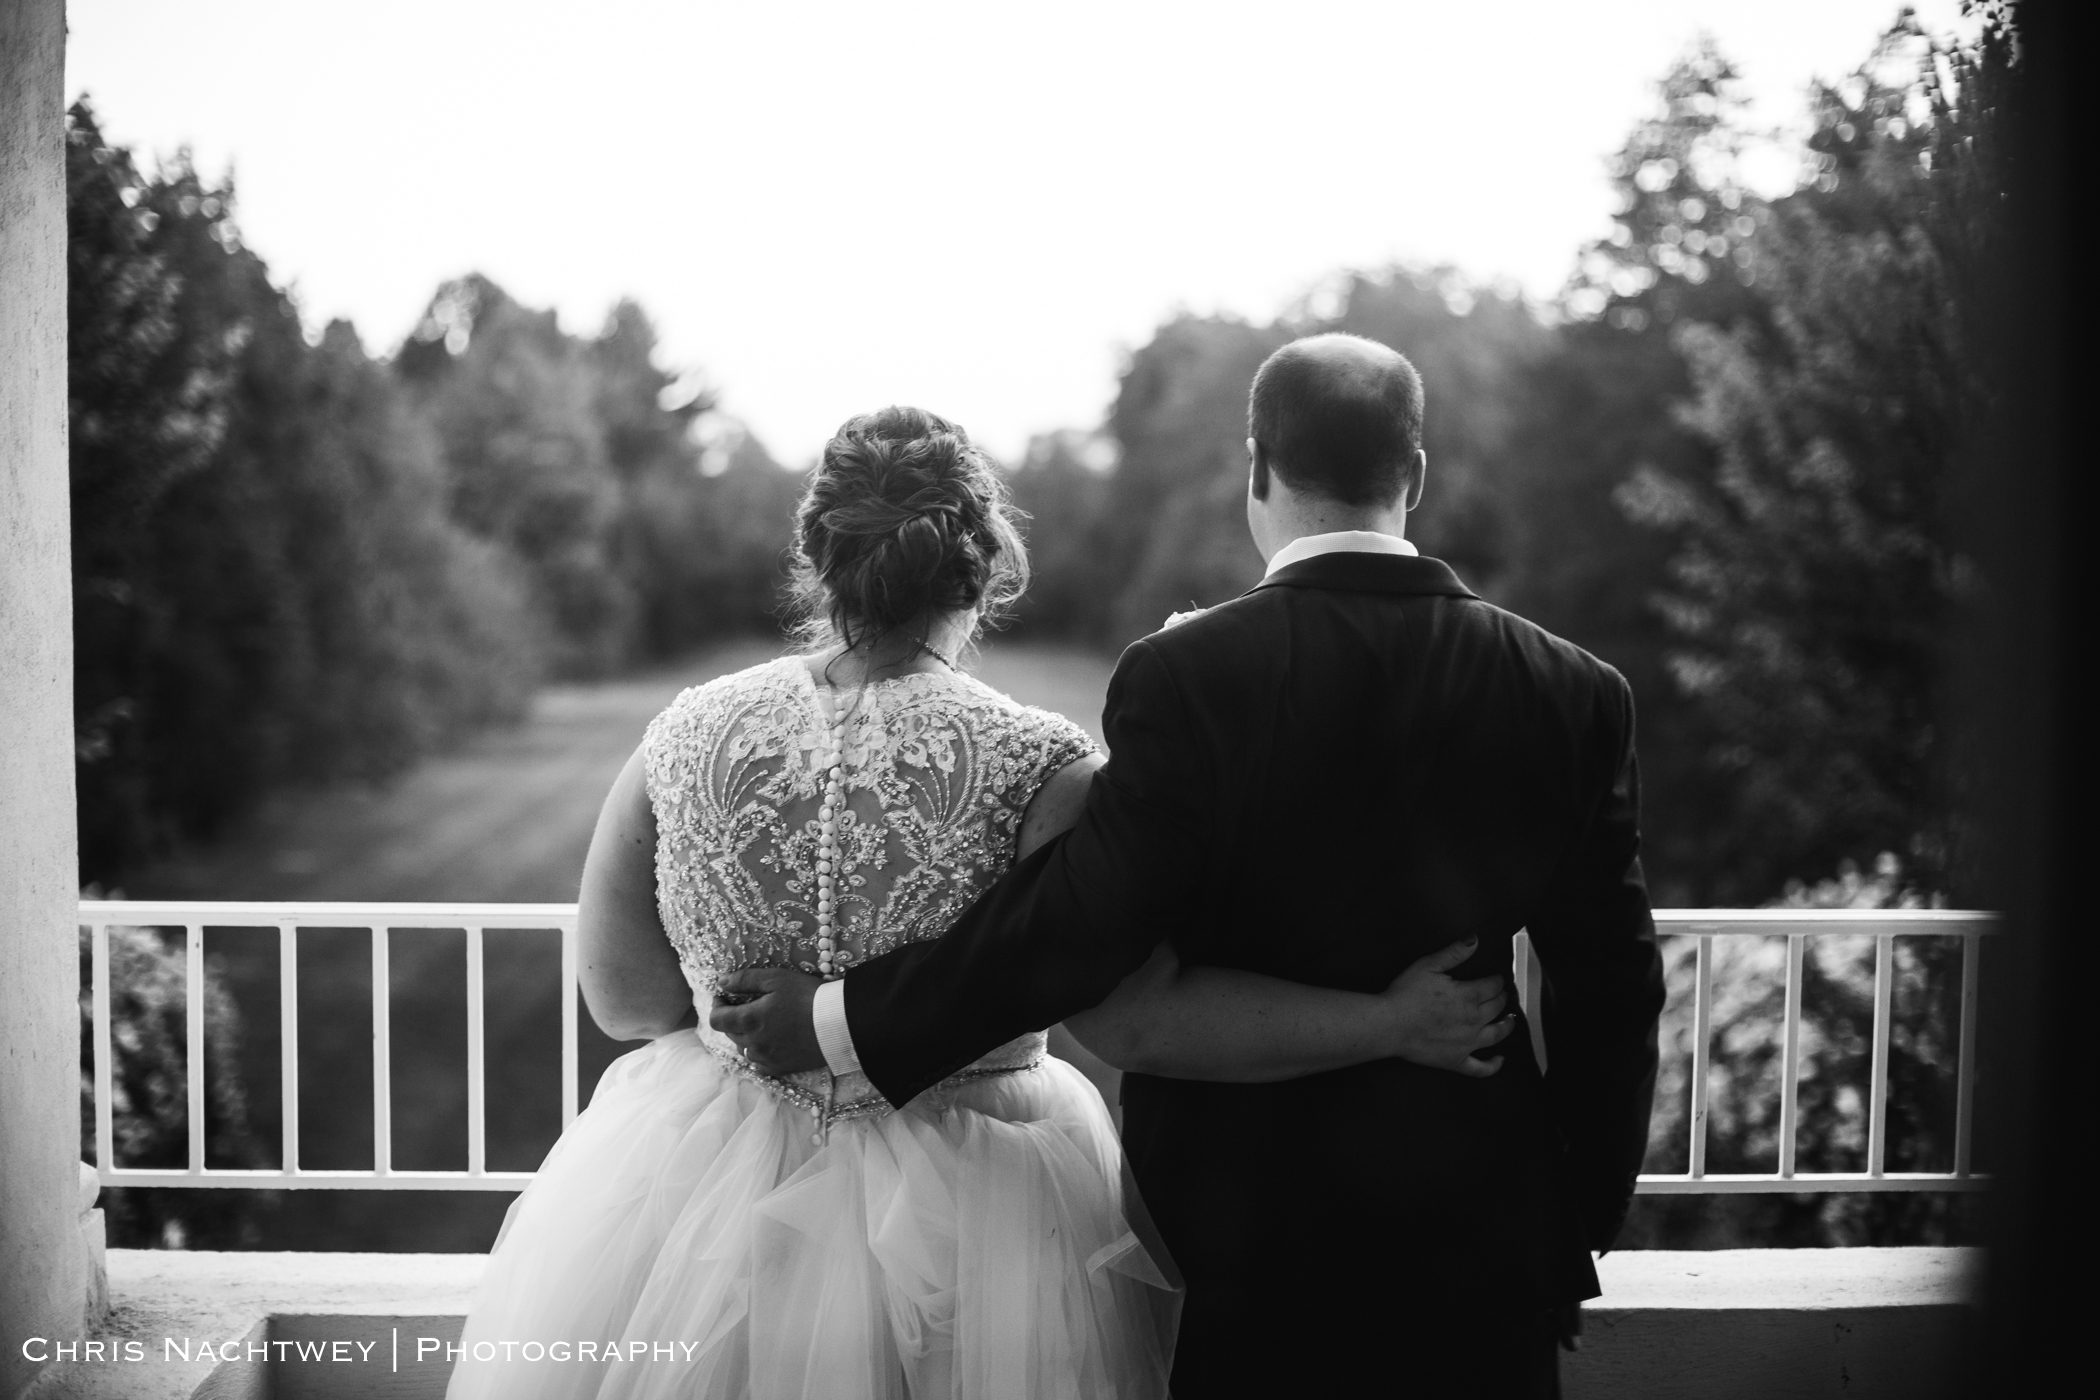 artistic-ct-wedding-photographers-chris-nachtwey-2017-44.jpg